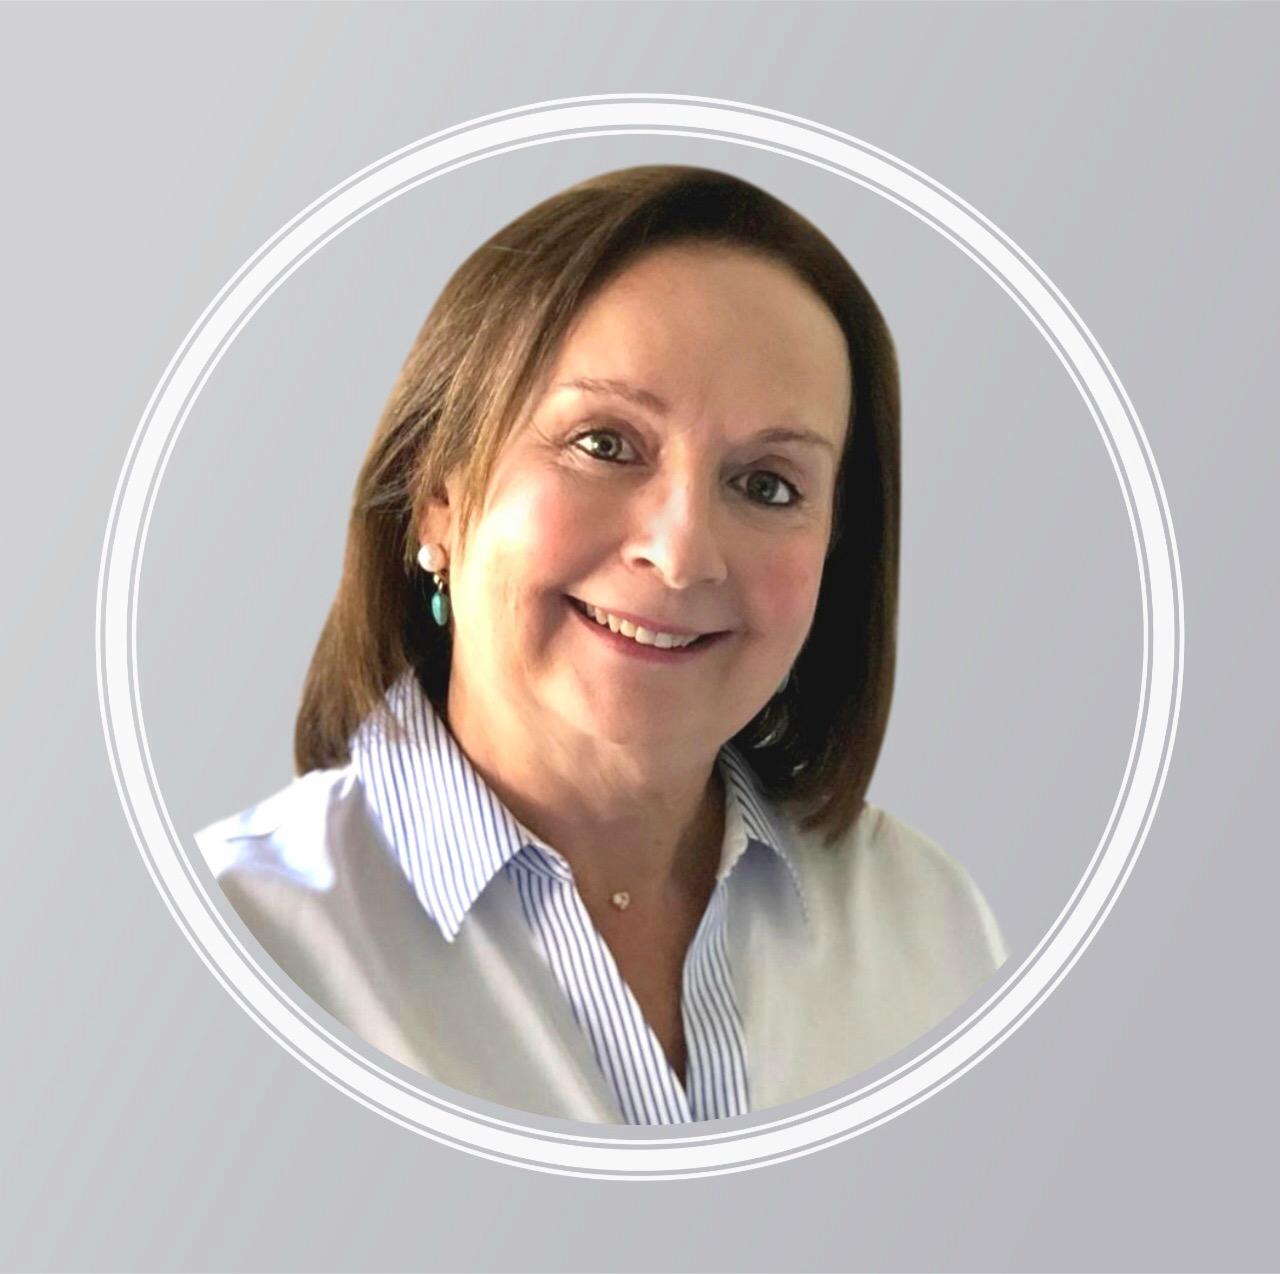 Lya Feldman-Chaberman